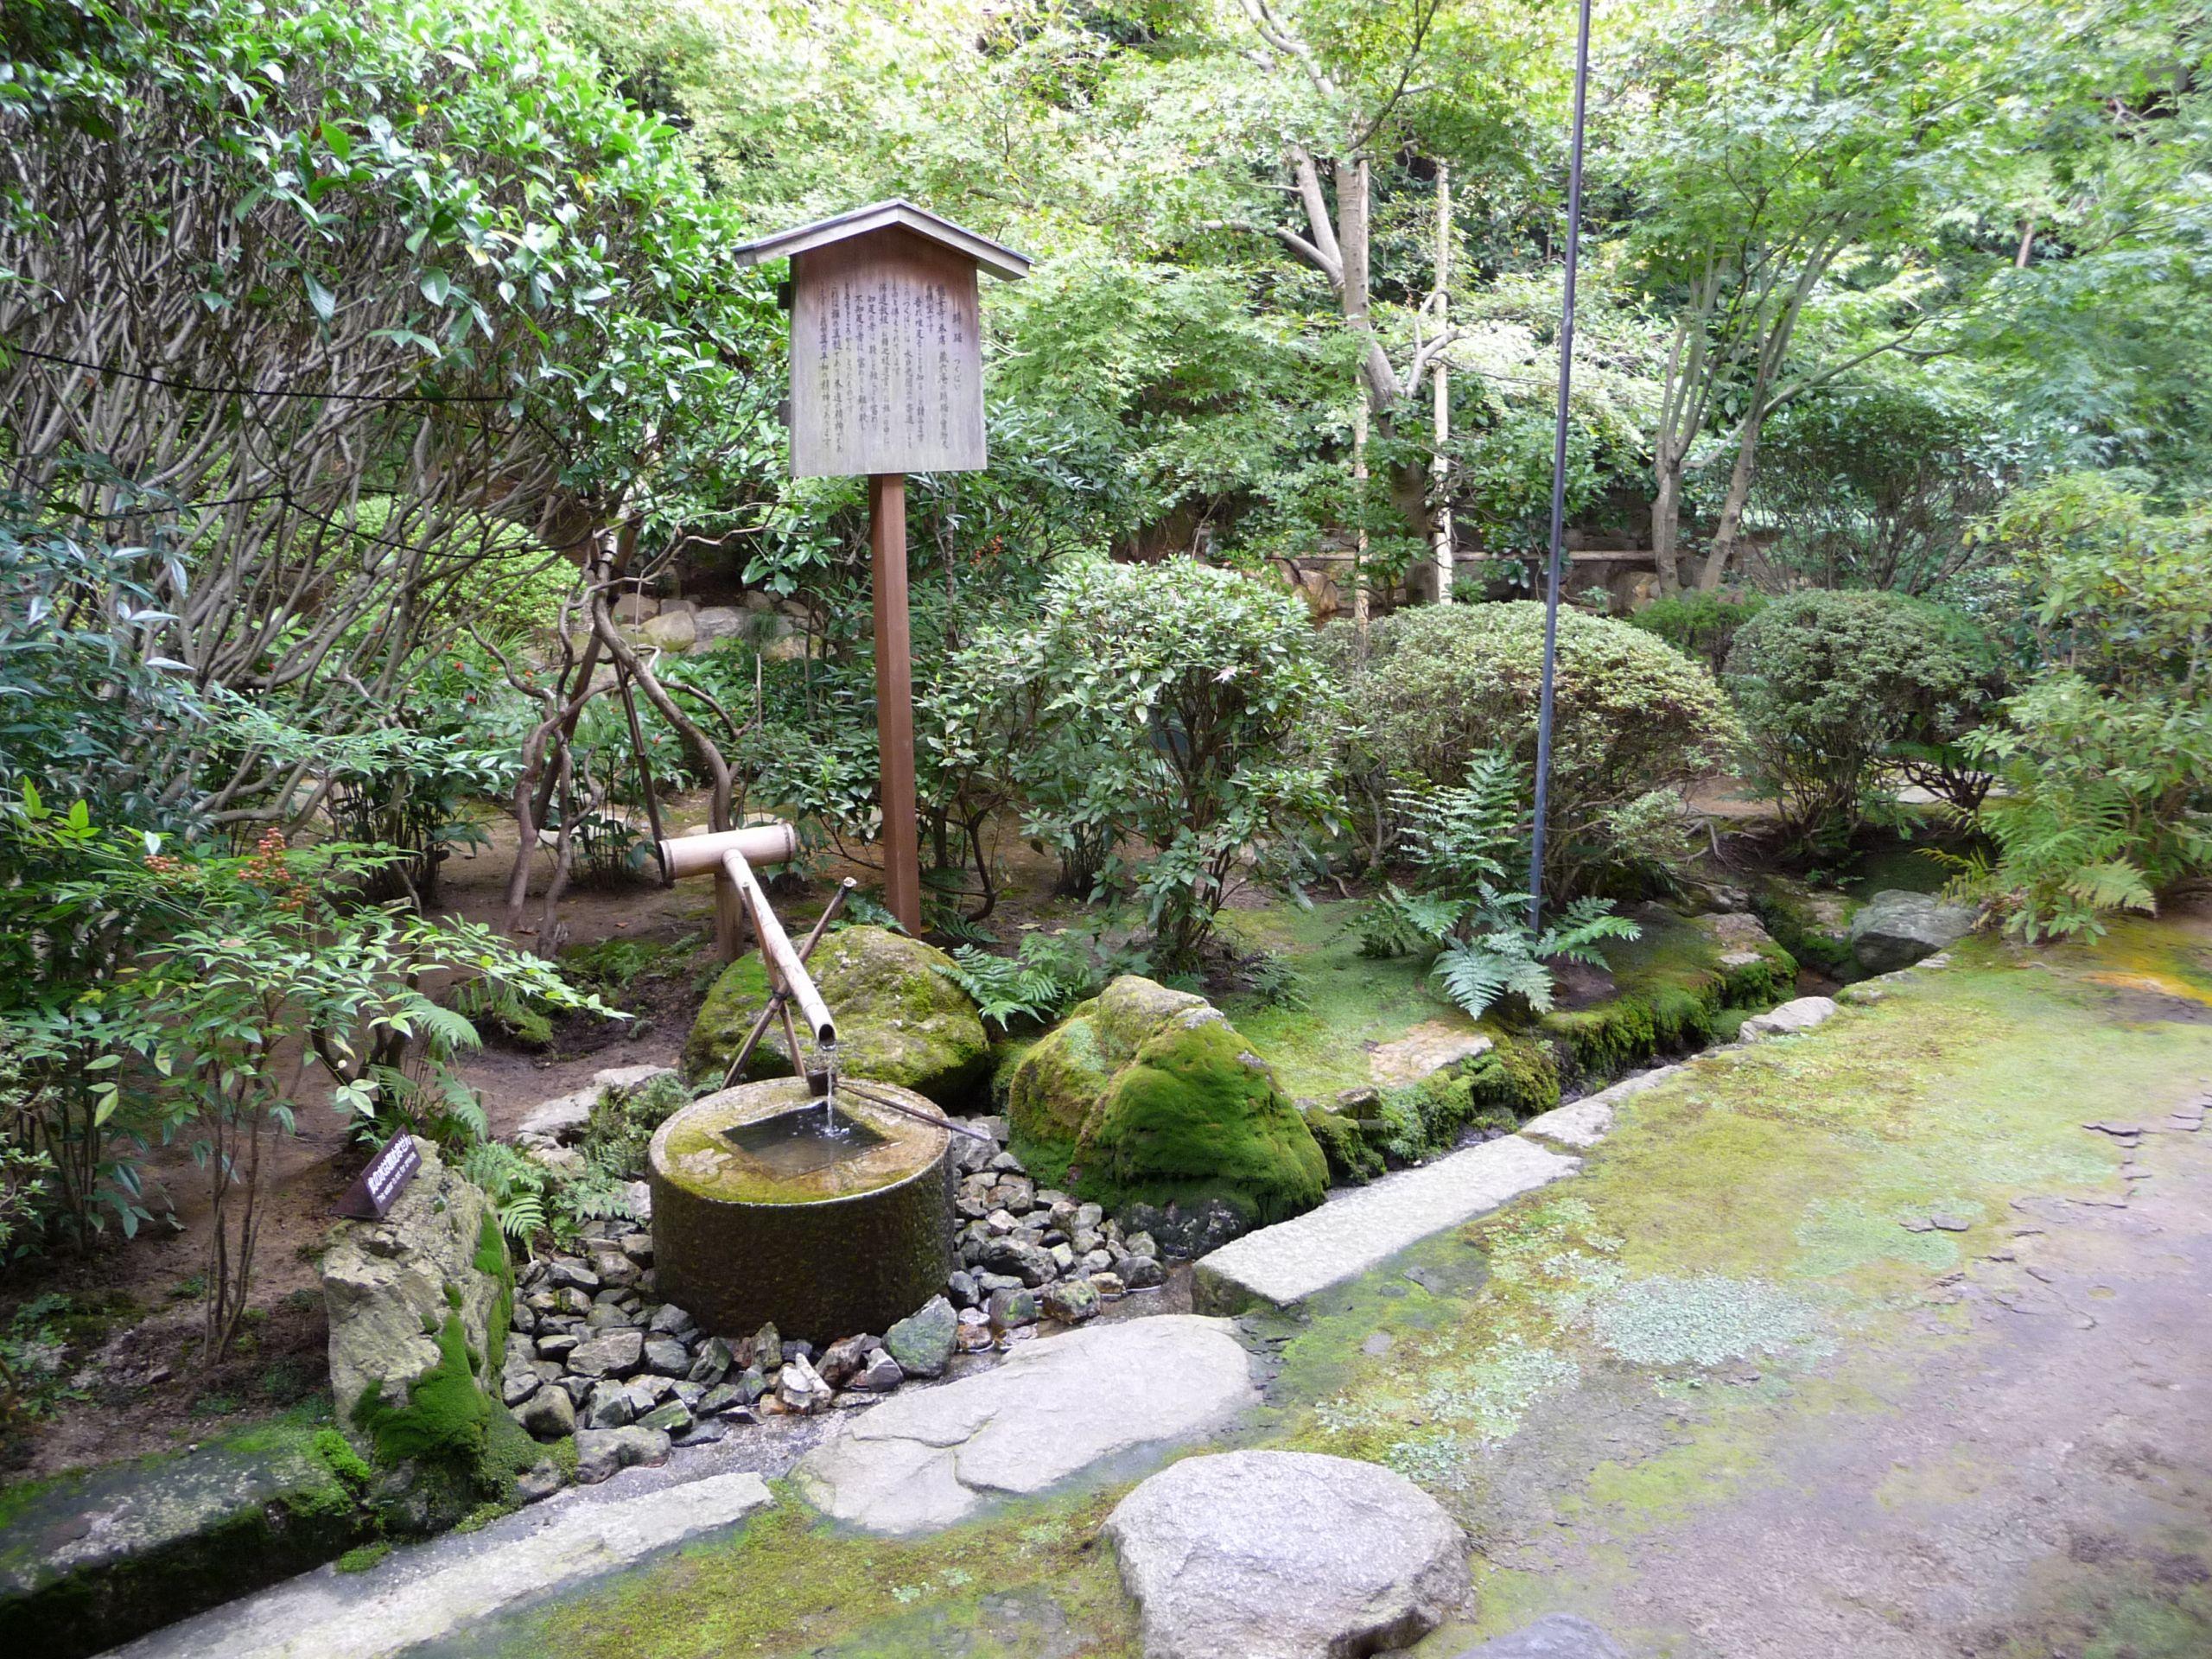 Fontaine Jardin Japonais Kyoto Jour 2 Kinkaku Ji Ryōan Ji Et ... serapportantà Fontaine Jardin Japonais